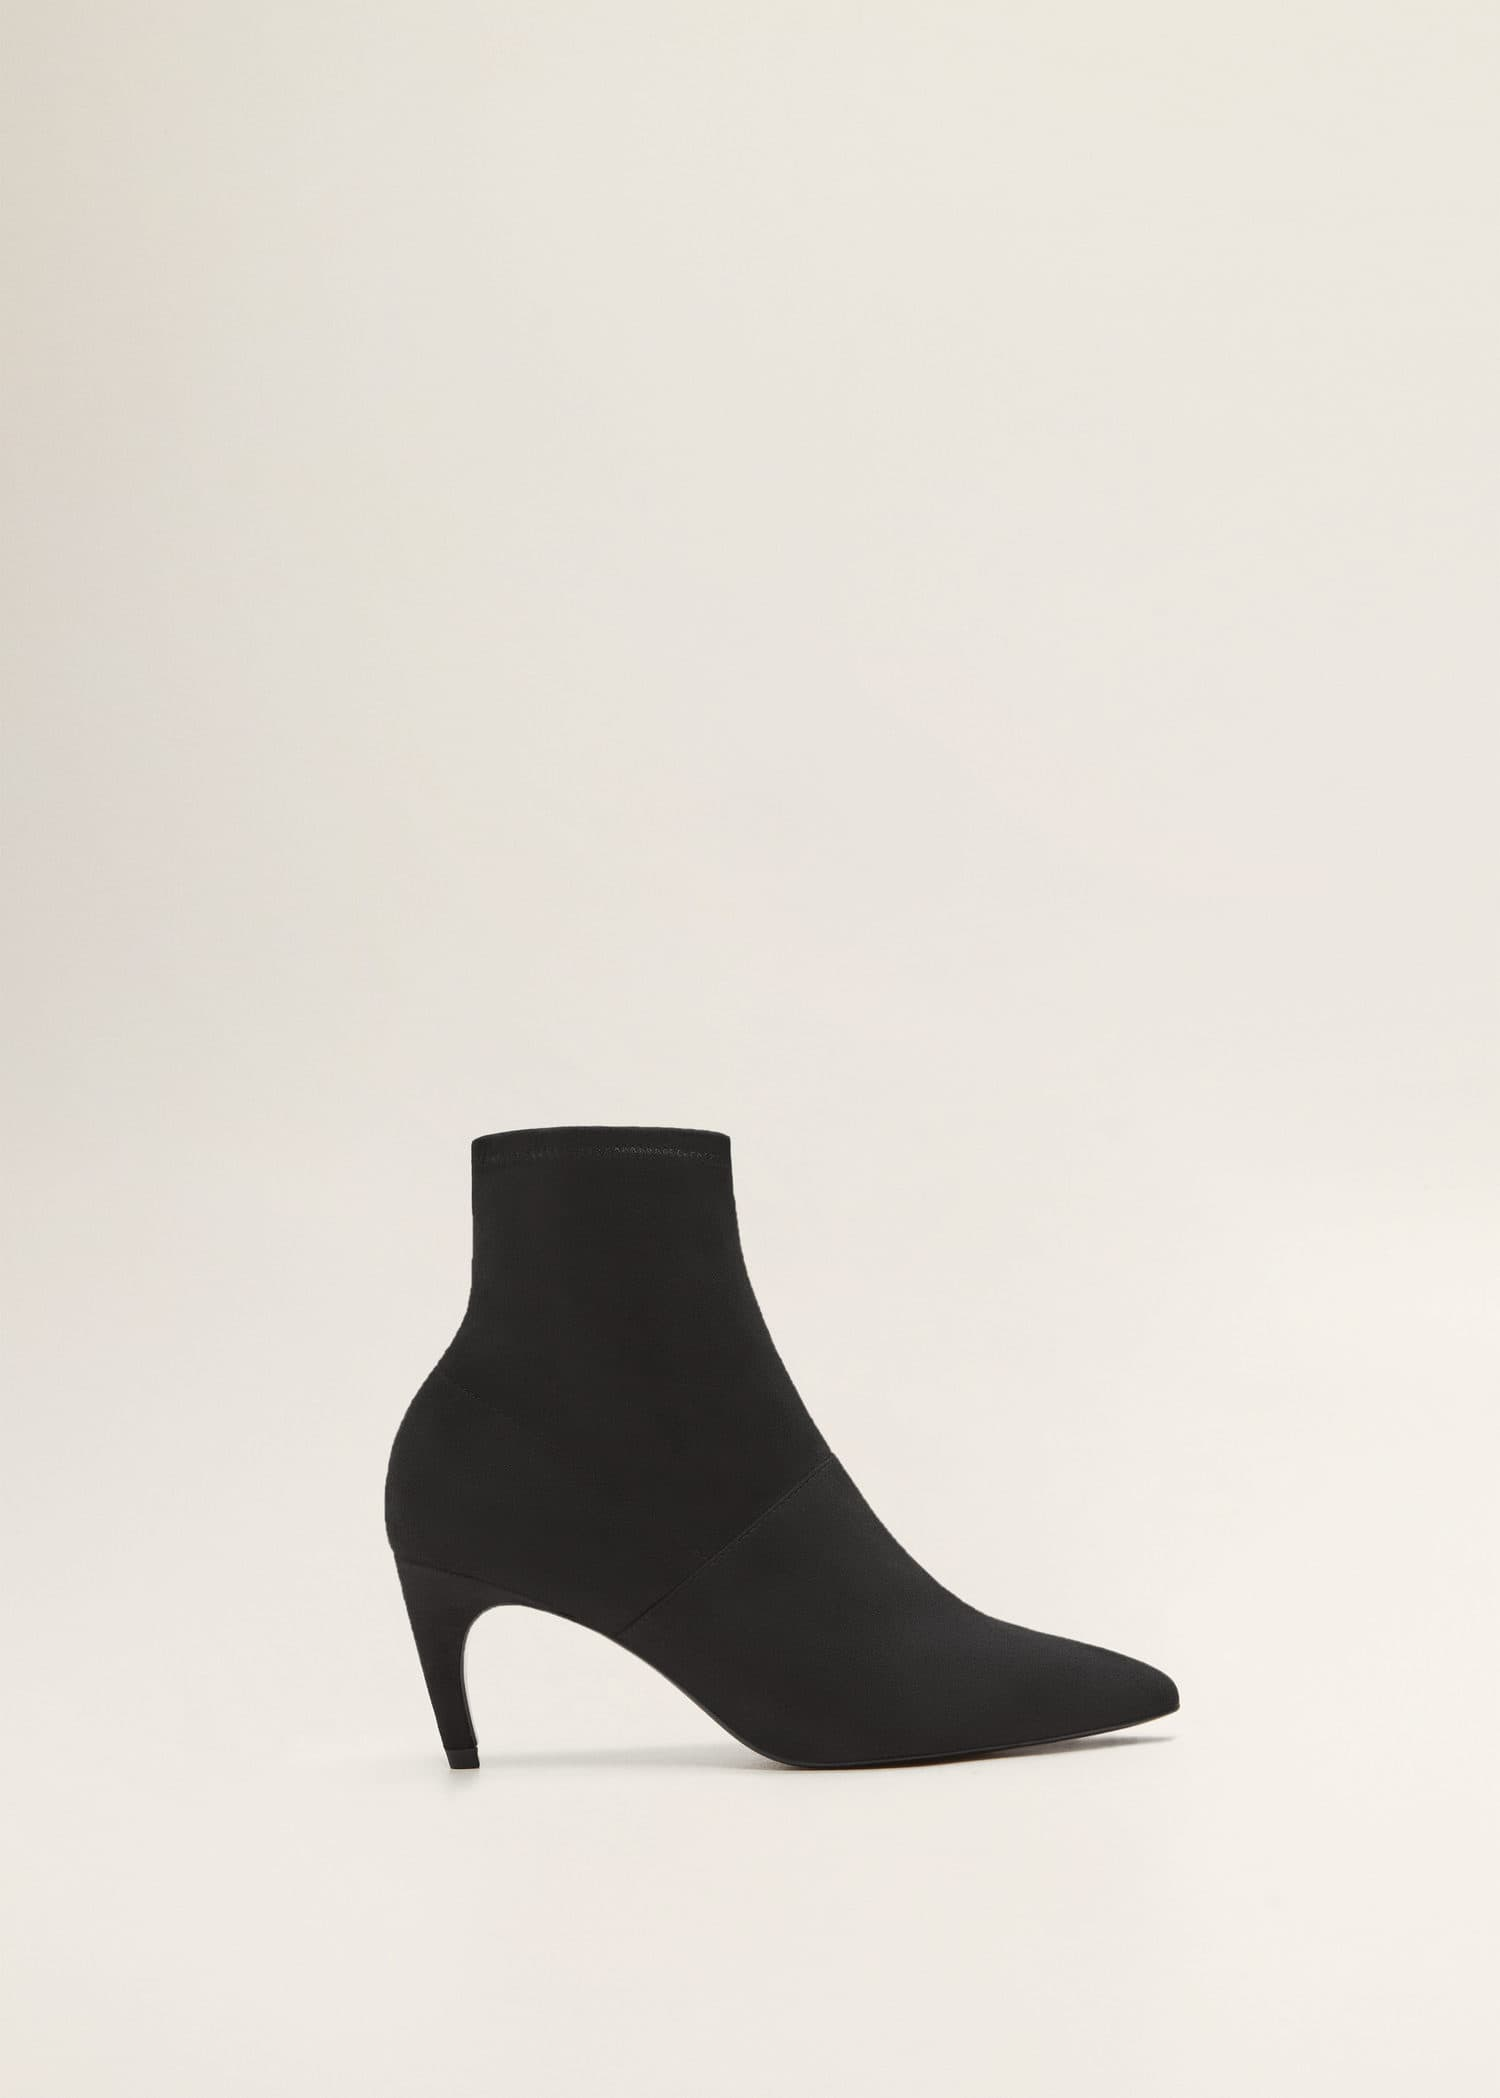 más fotos varios estilos moda mejor valorada Zapatos - Accesorios - Mujer | OUTLET España